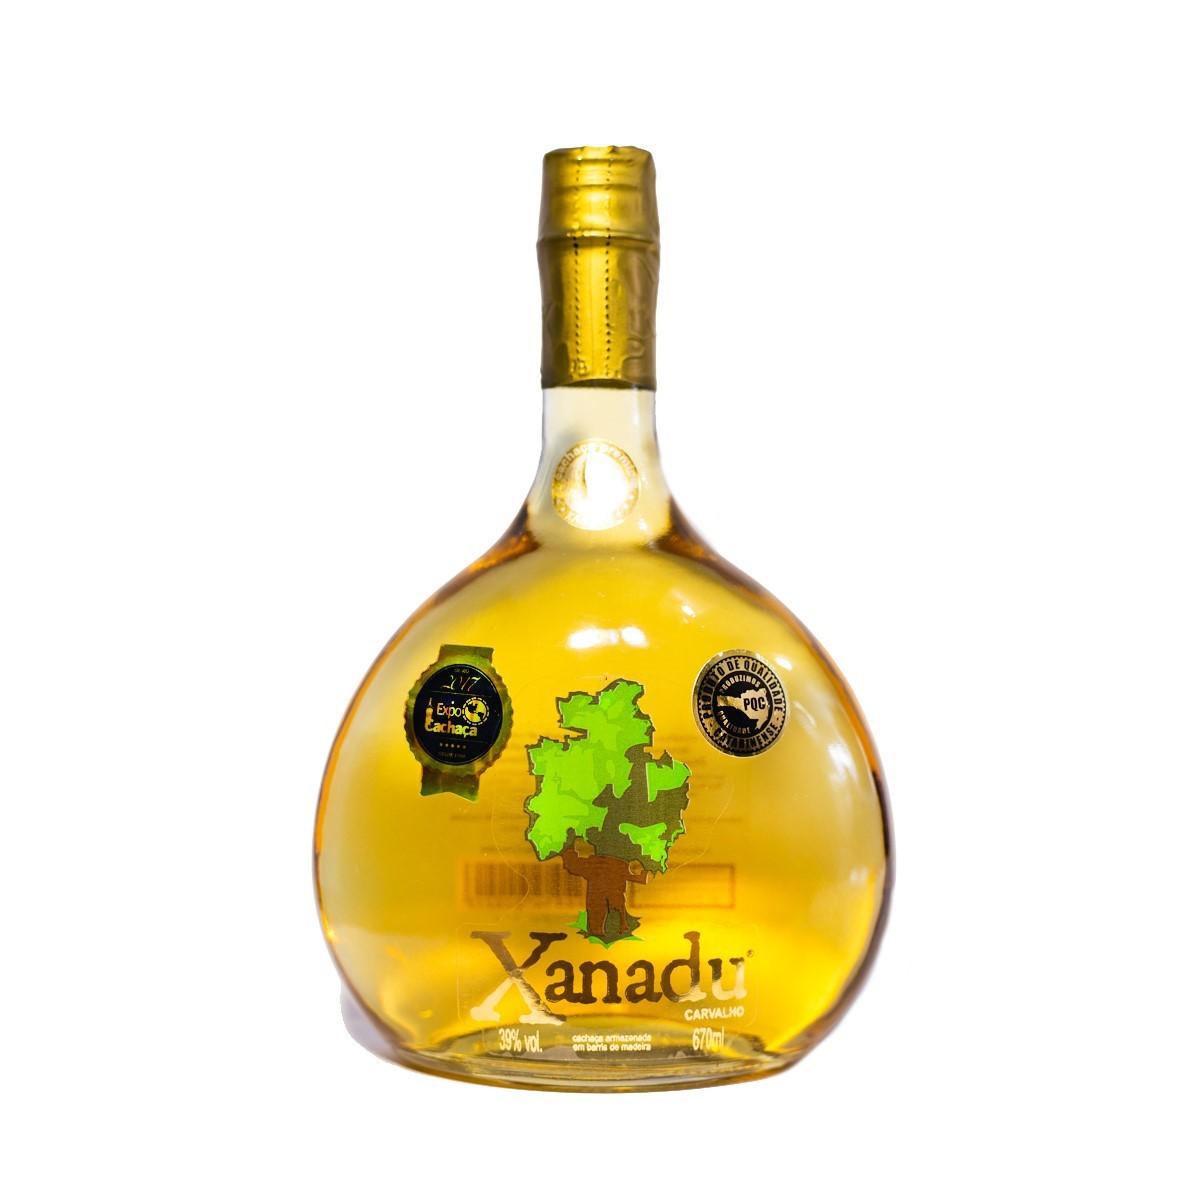 Cachaça Ouro - 6 anos - Xanadu - 670 ml